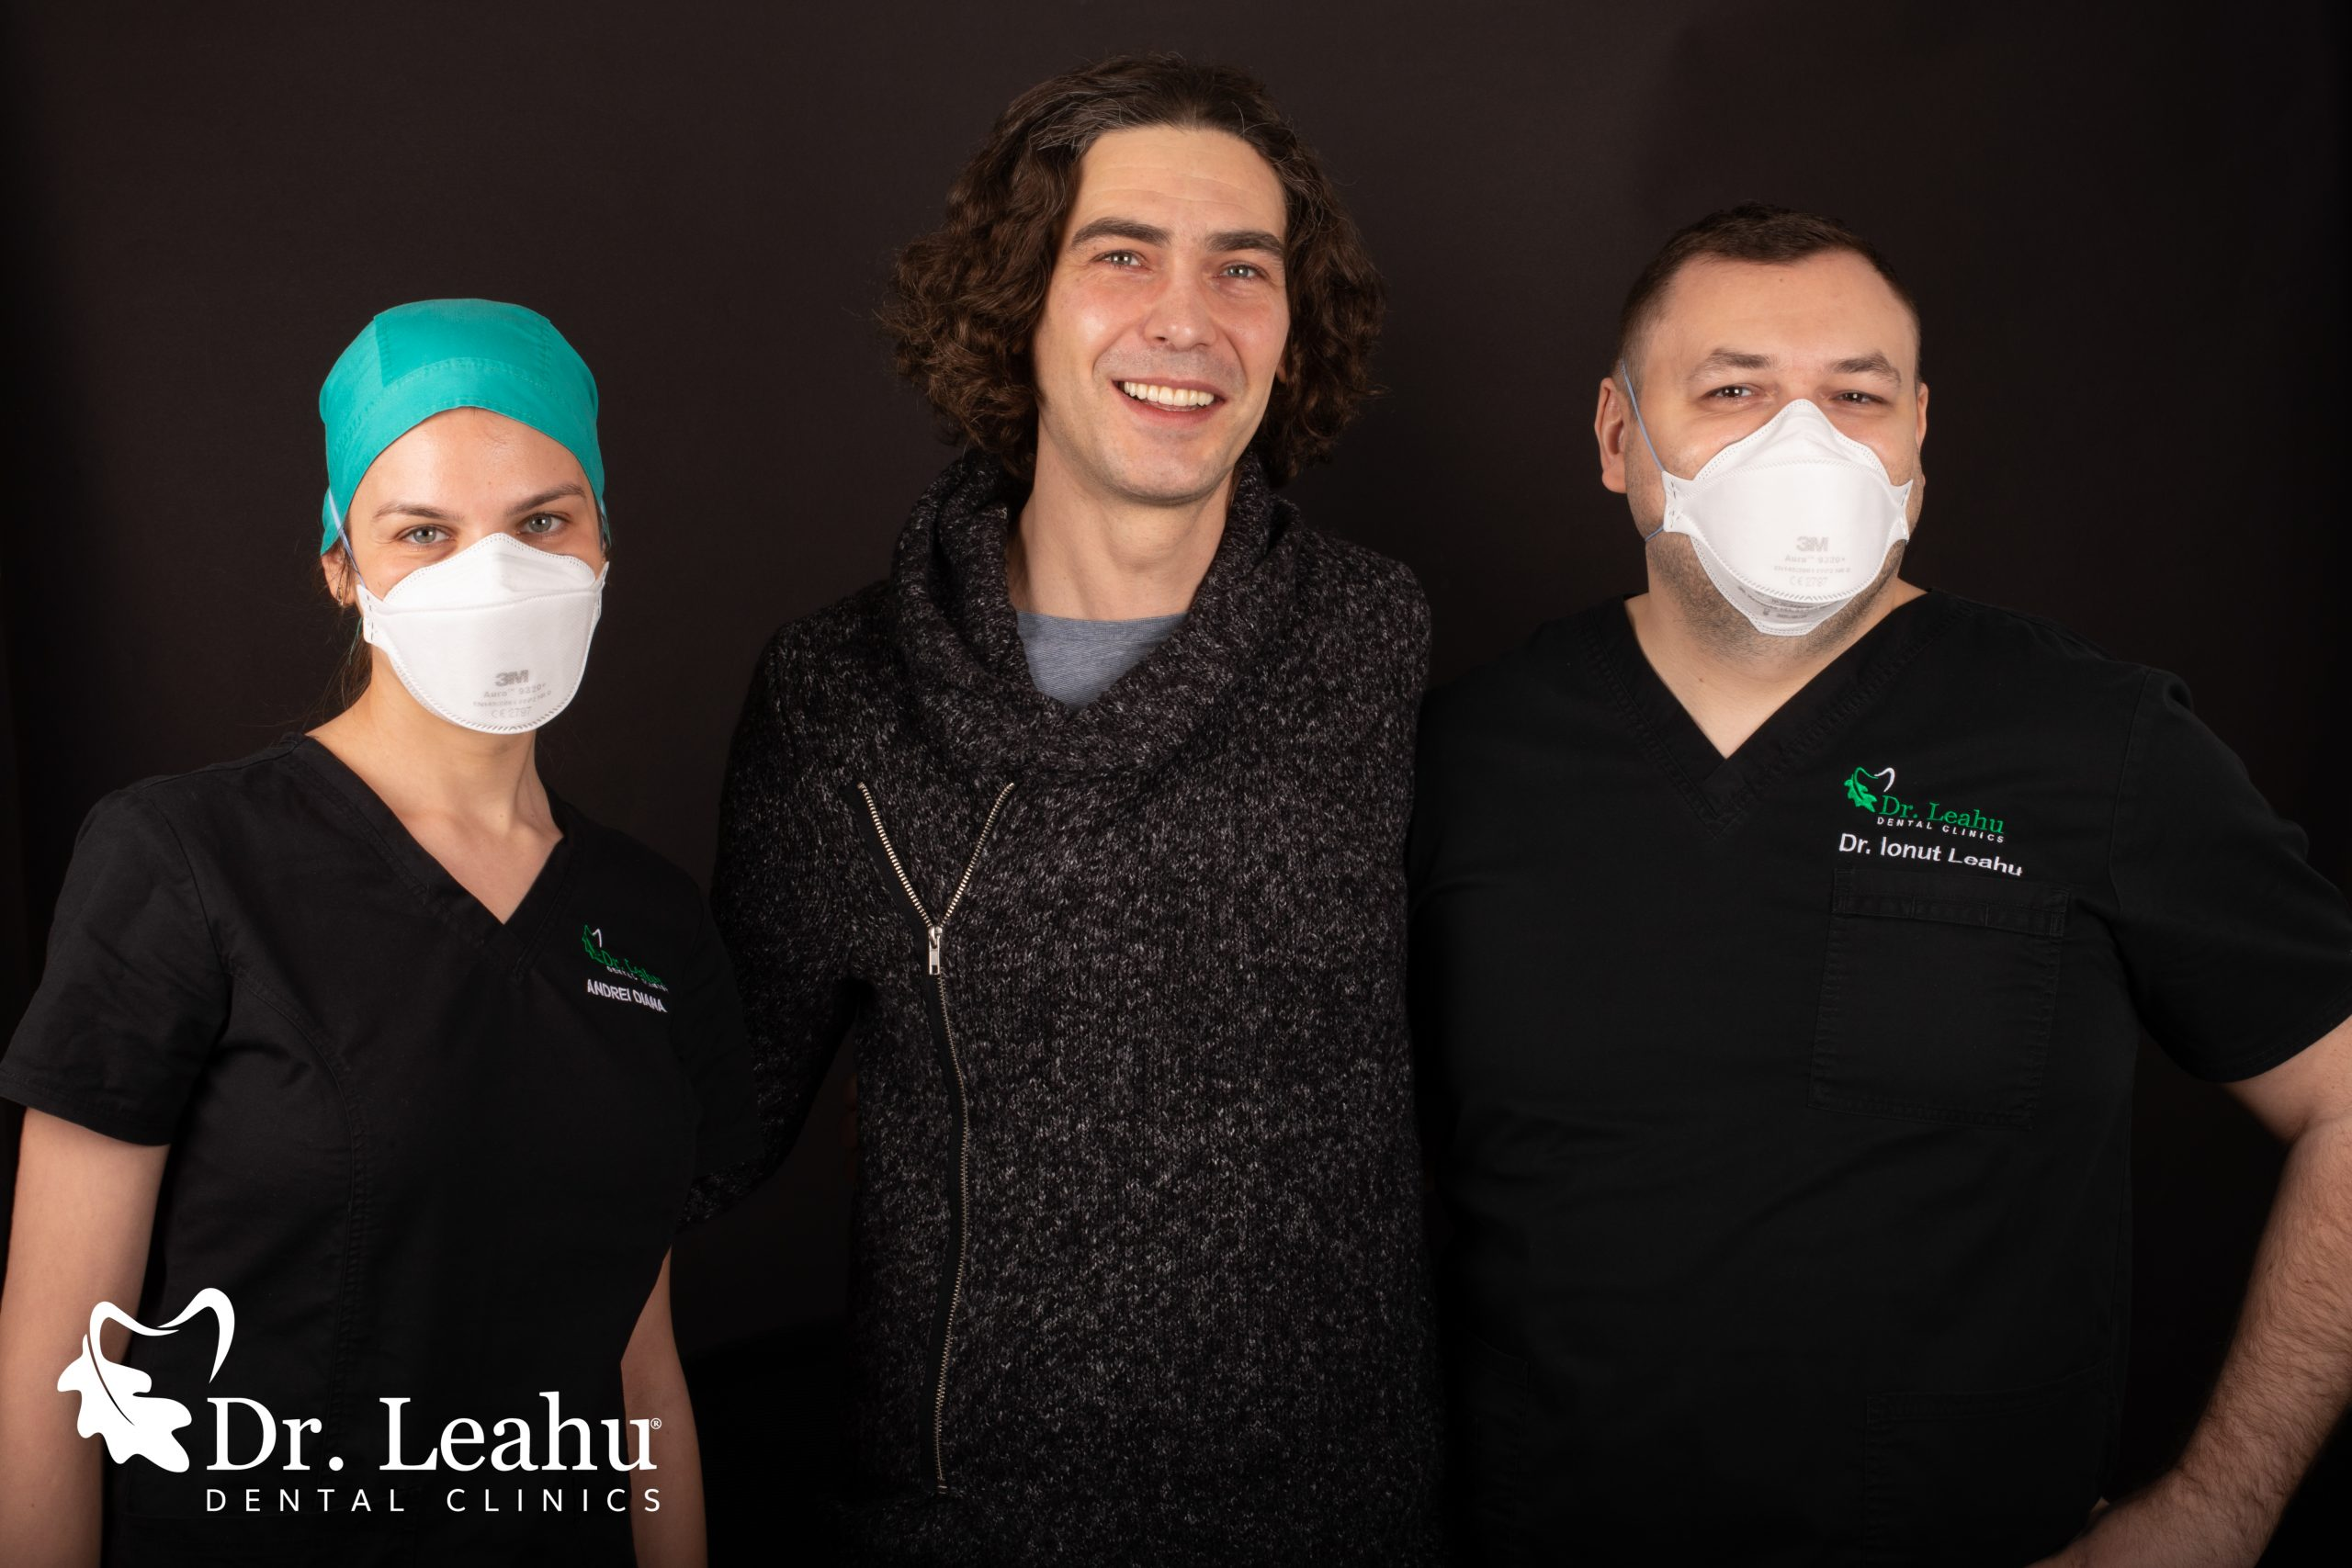 medic dentist in stanga, pacient in mijloc, medic implantolog in dreapta